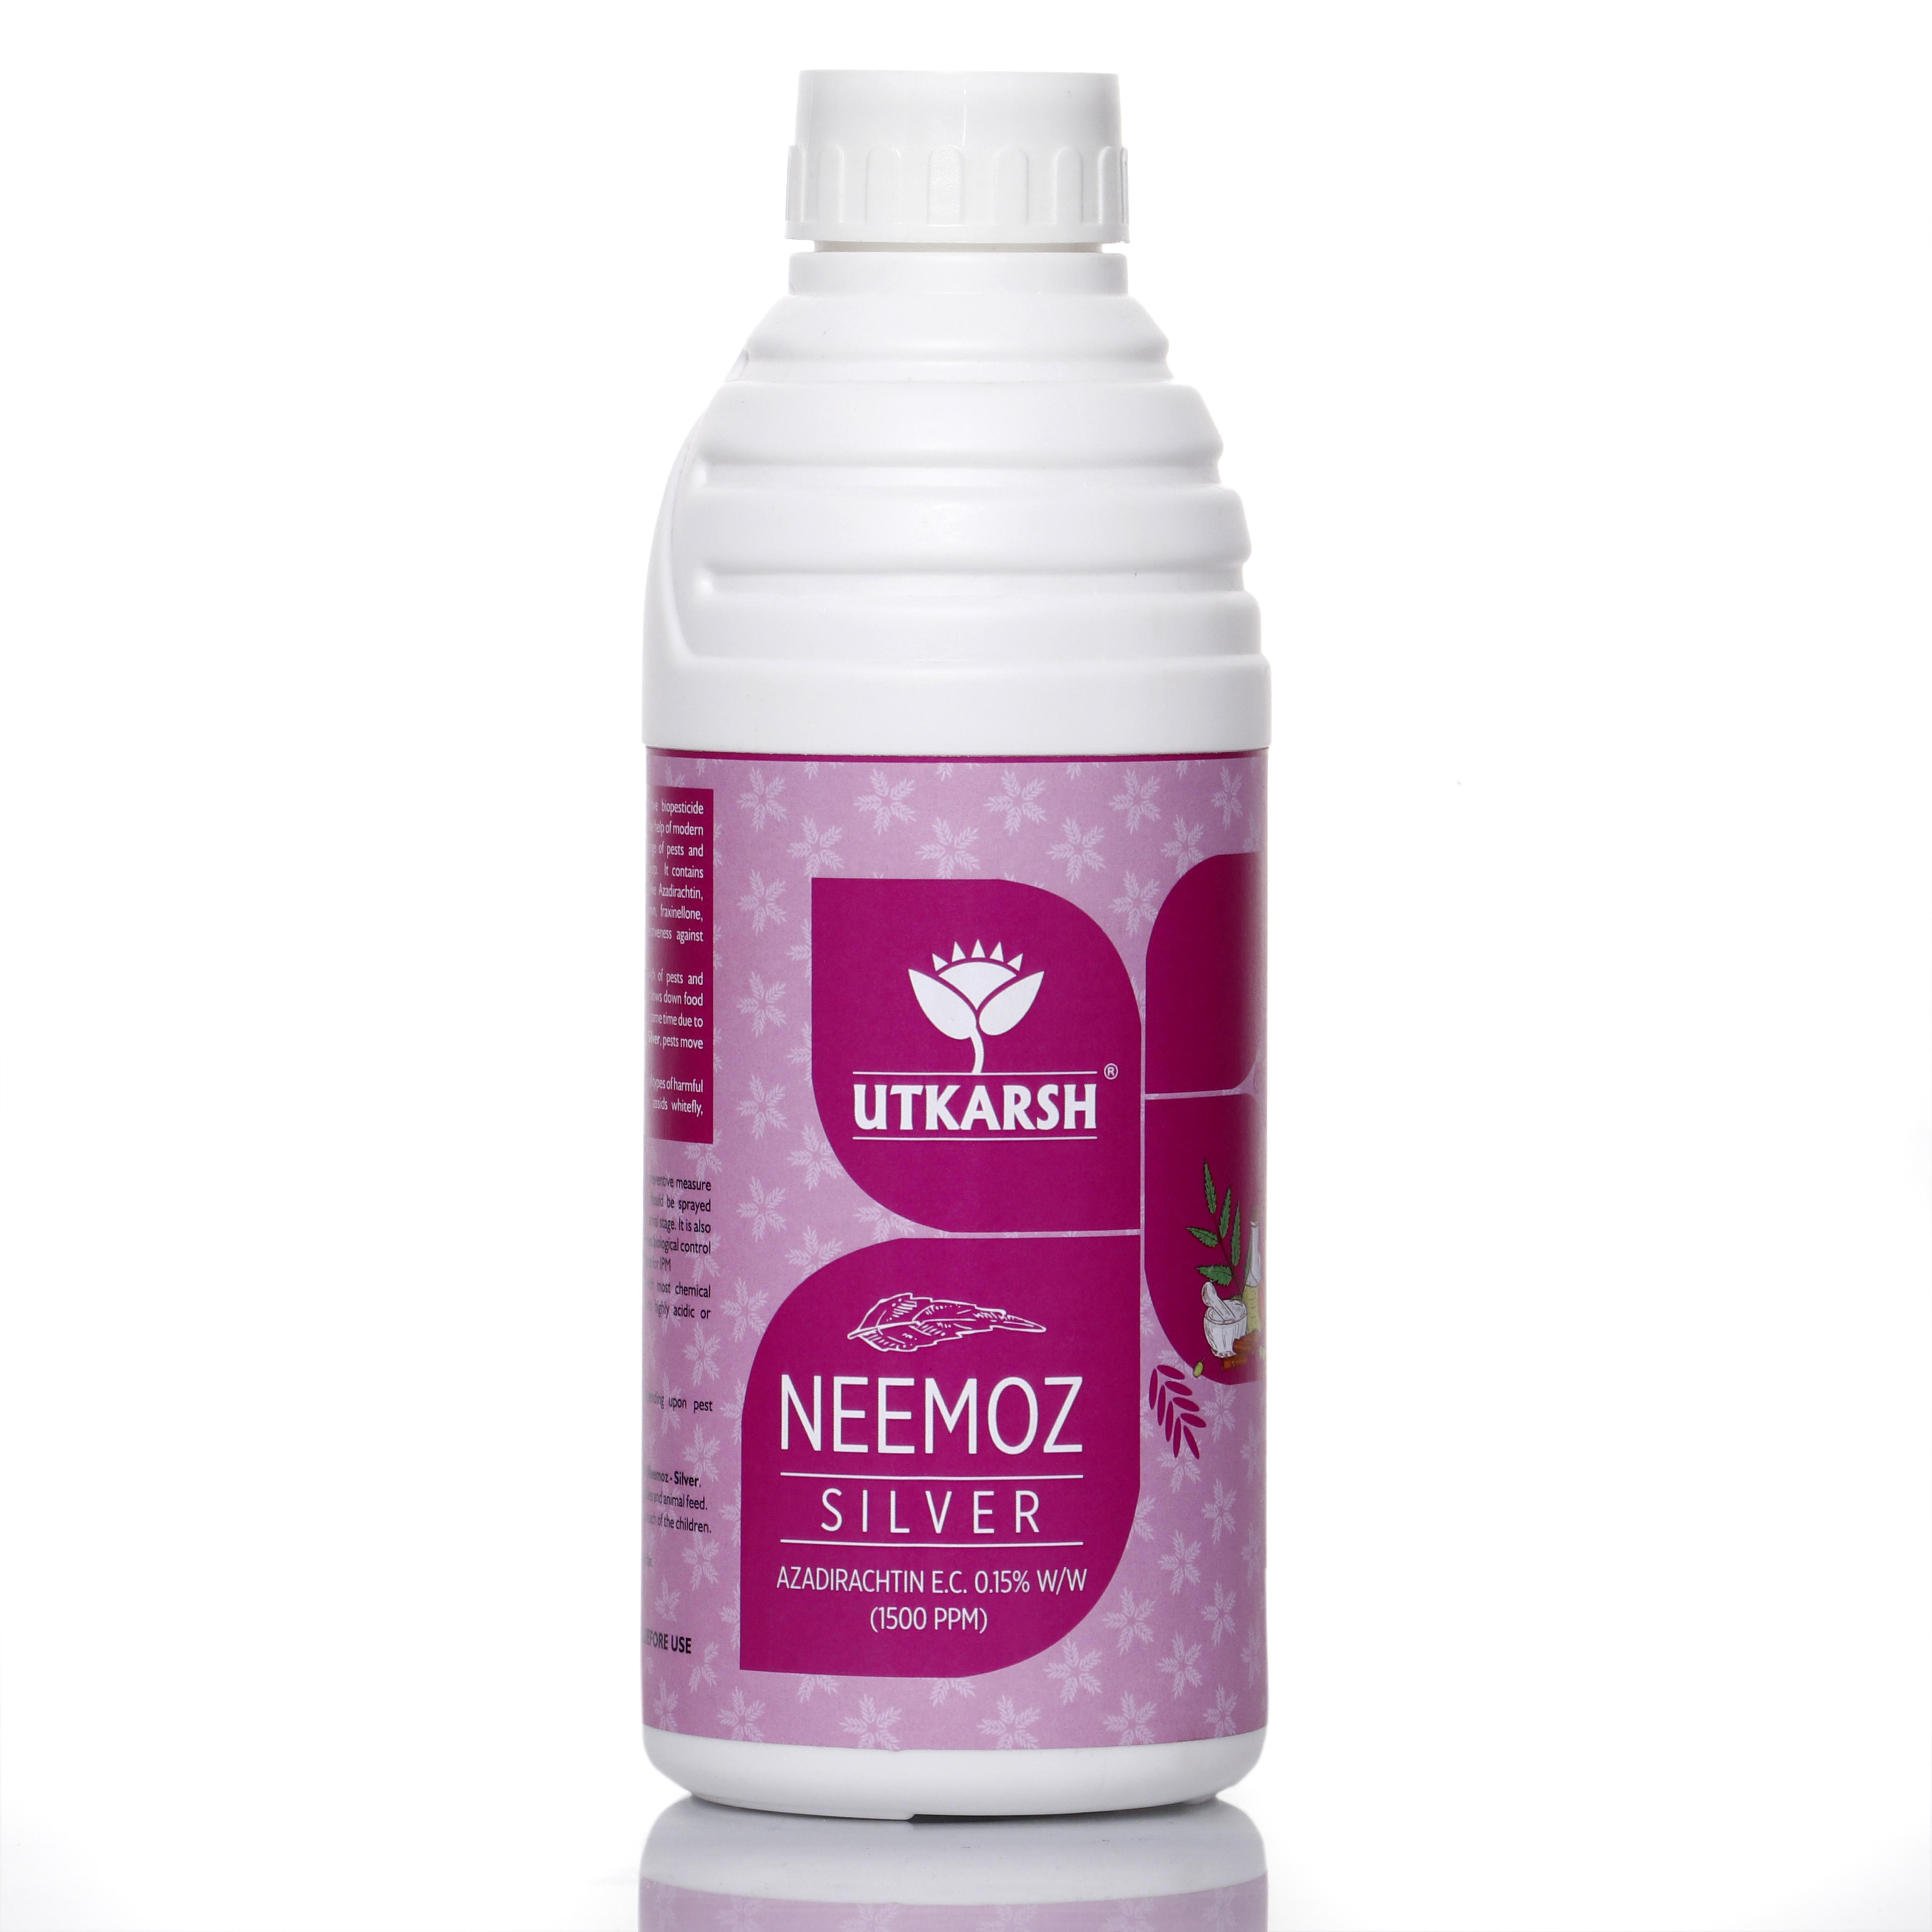 Utkarsh Neemoz - Silver (Natural Neem Oil With 1500 ppm Azadirhactin)